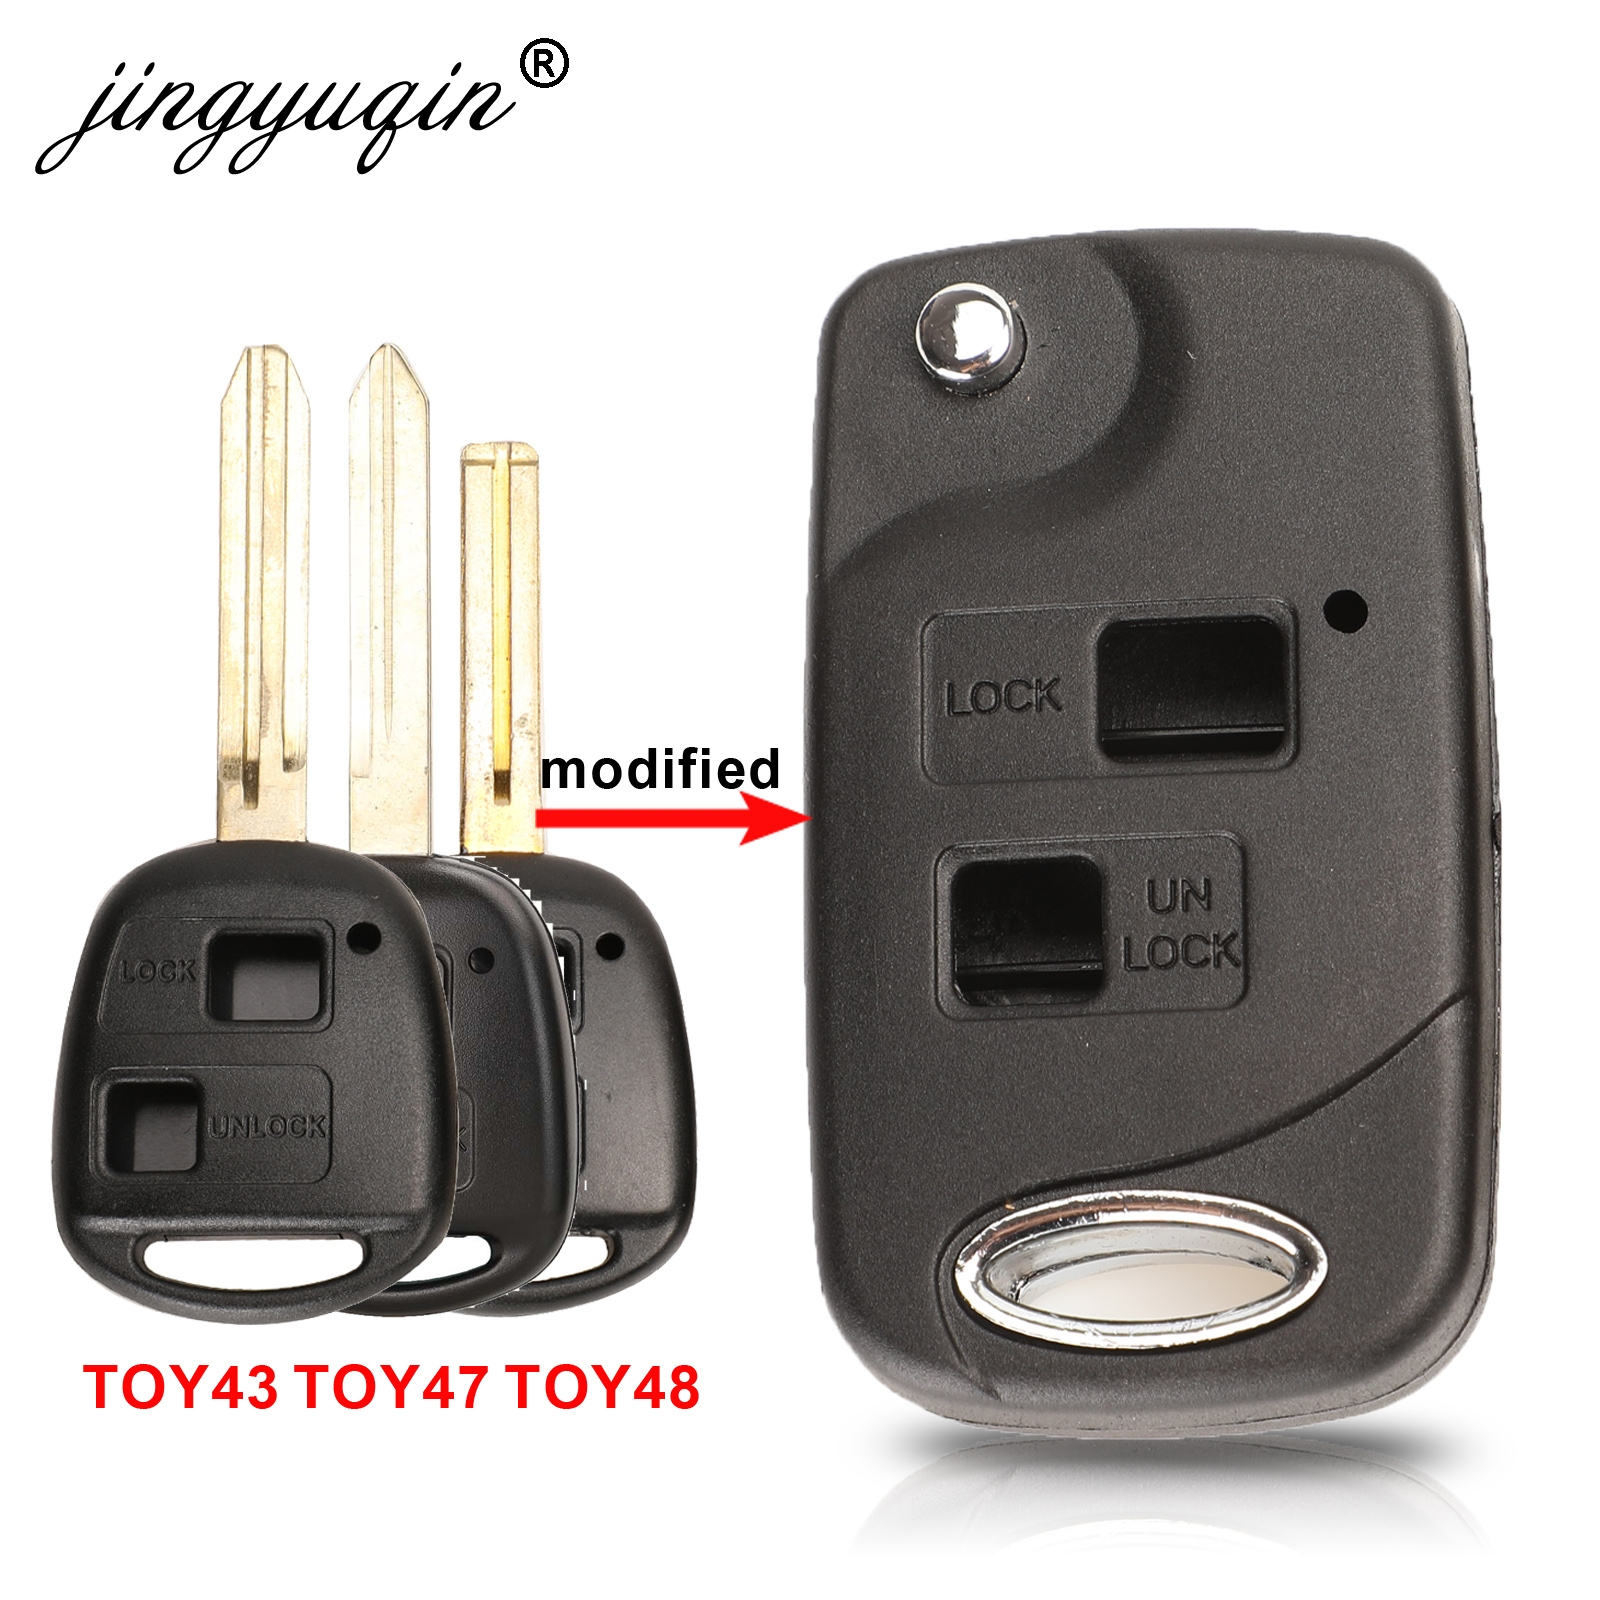 Jingyuqin флип 2 кнопки дистанционного ключа оболочки для Toyota RAV4 Avalon Echo Prado Tarago Camry Tarago TOY43 / TOY47 TOY48 Fob чехол